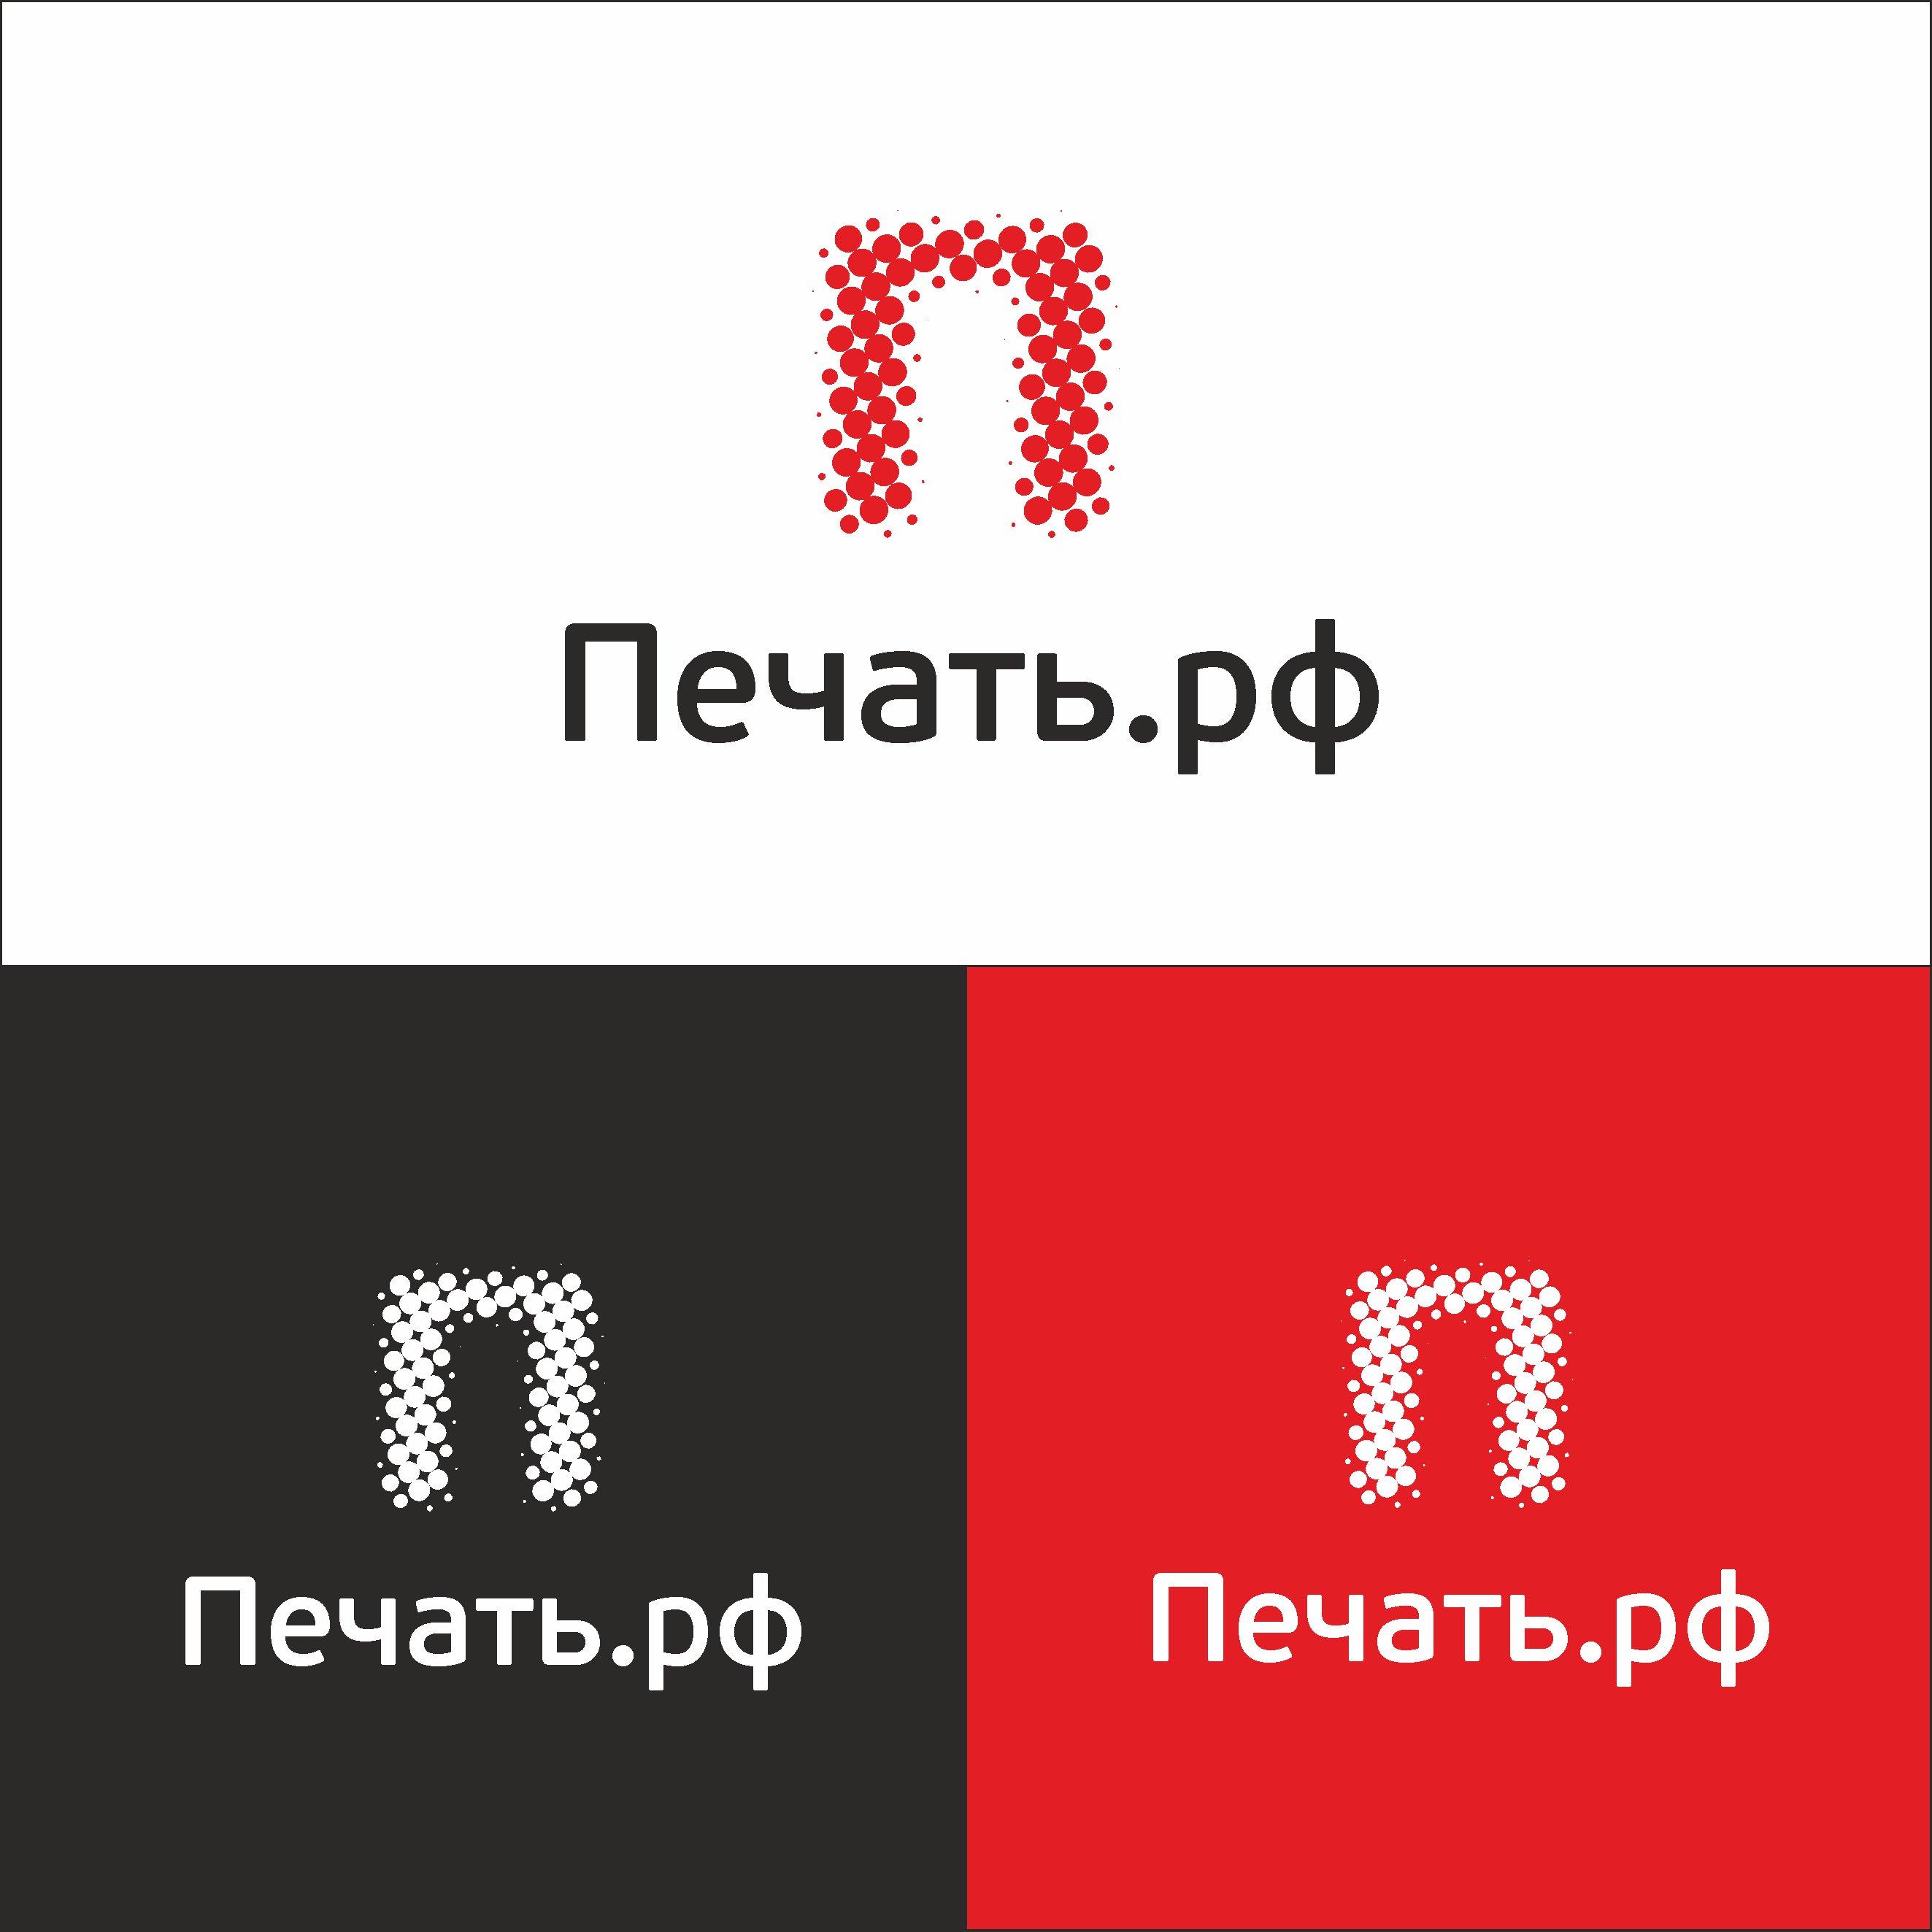 Логотип для веб-сервиса интерьерной печати и оперативной пол фото f_8585d29cc23d0363.jpg